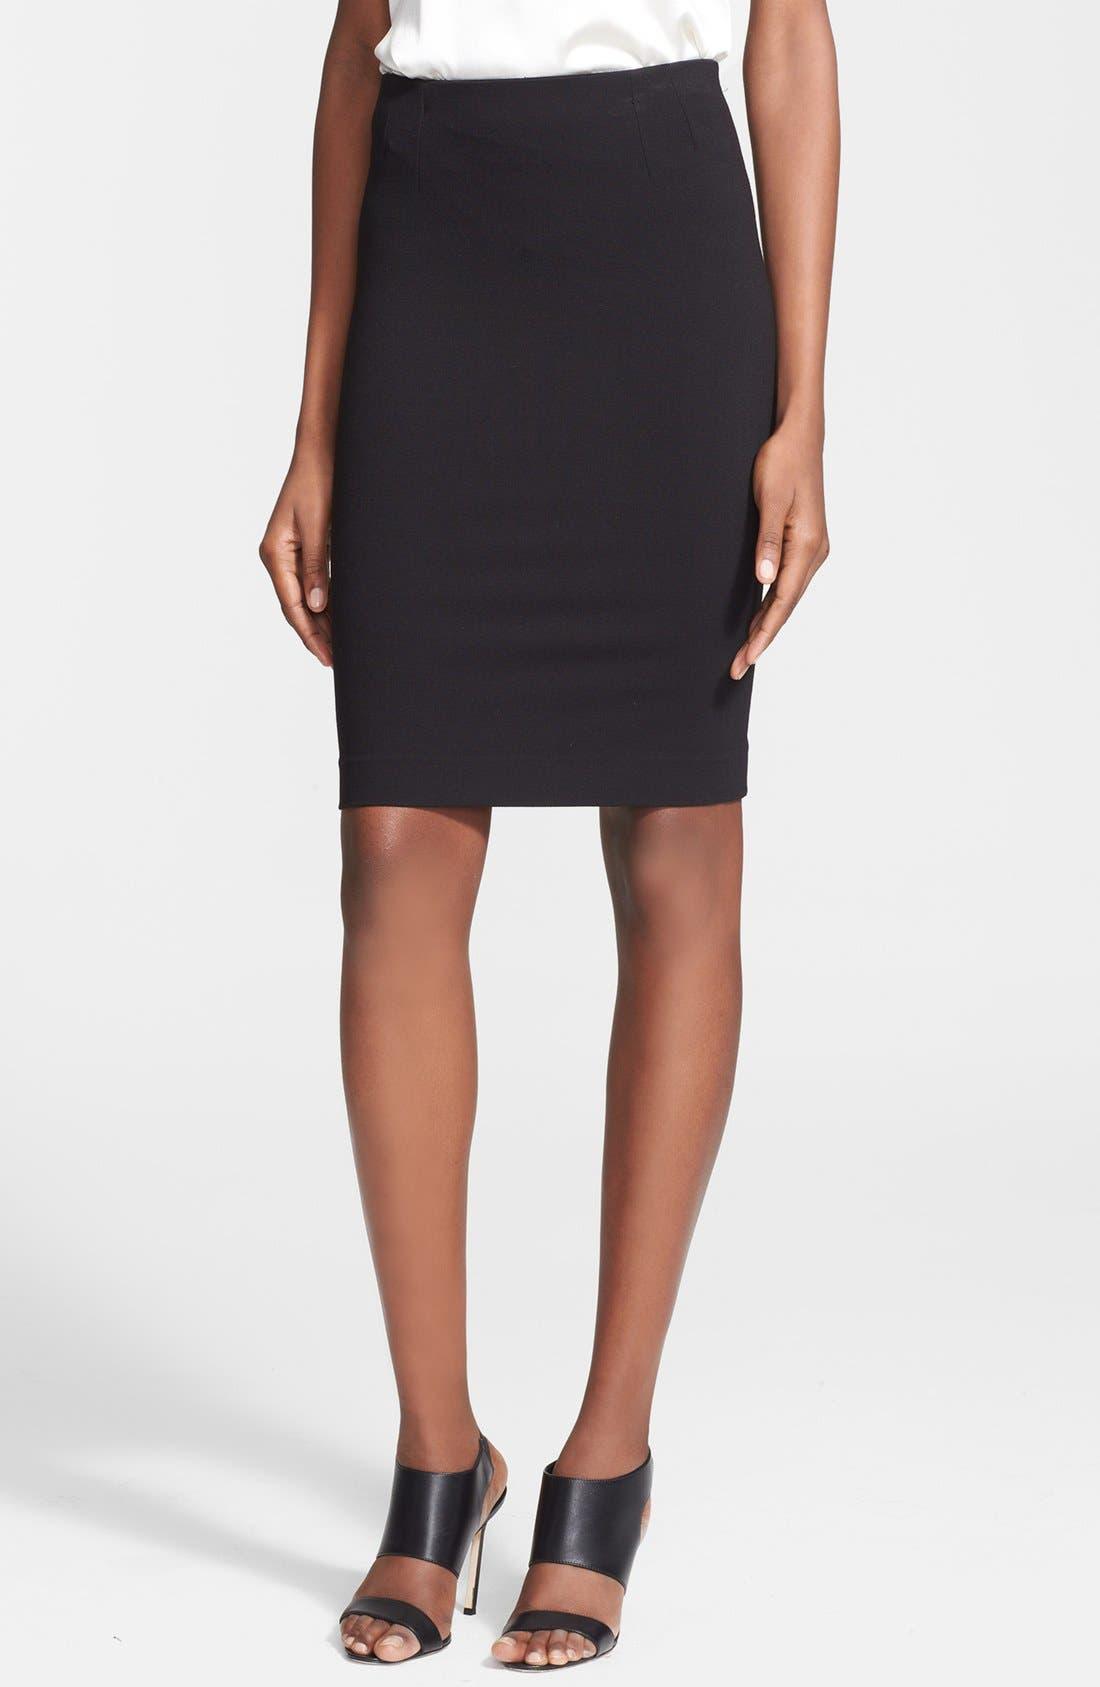 Alternate Image 1 Selected - M Missoni Ponte Knit Pencil Skirt